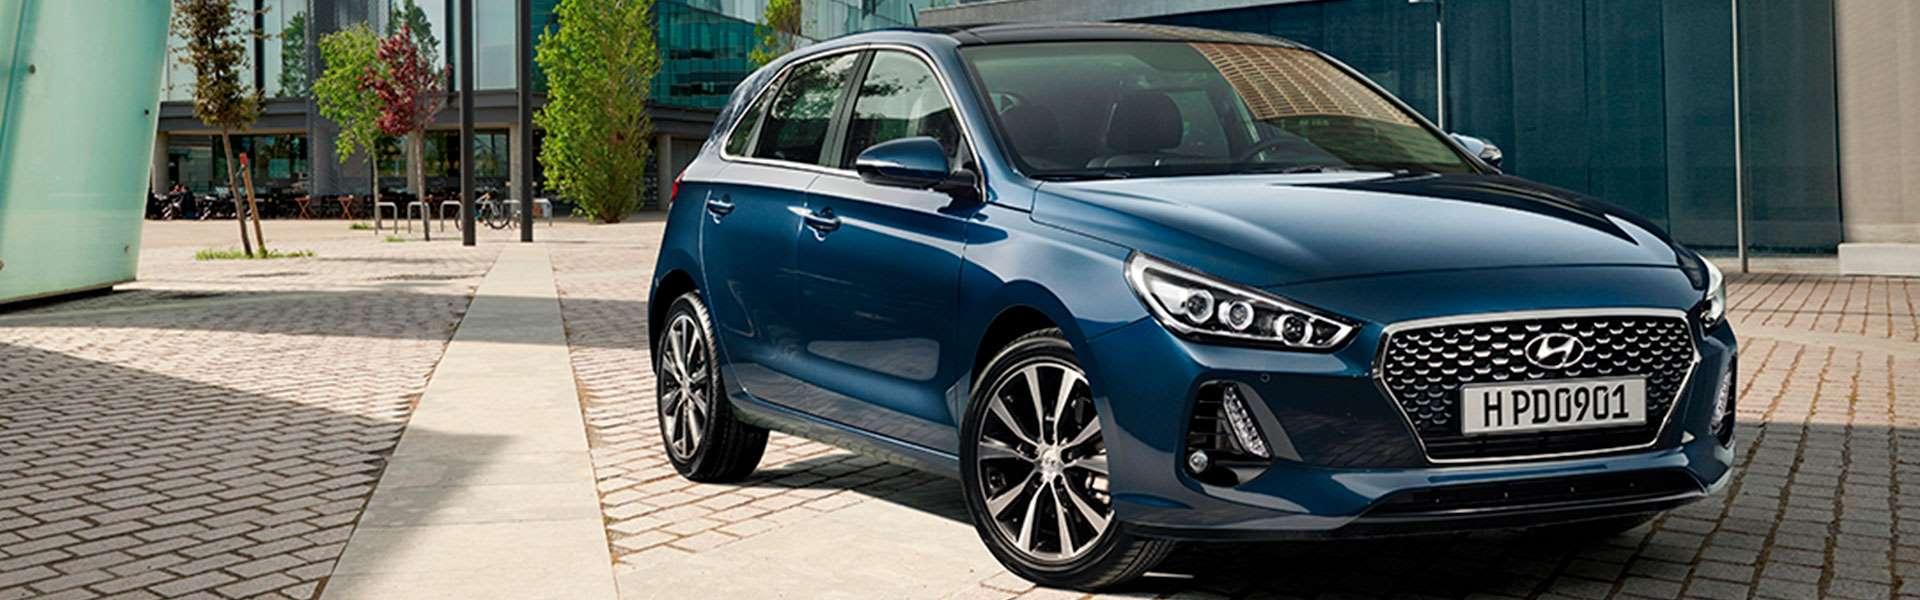 Hyundai i30 - обзор